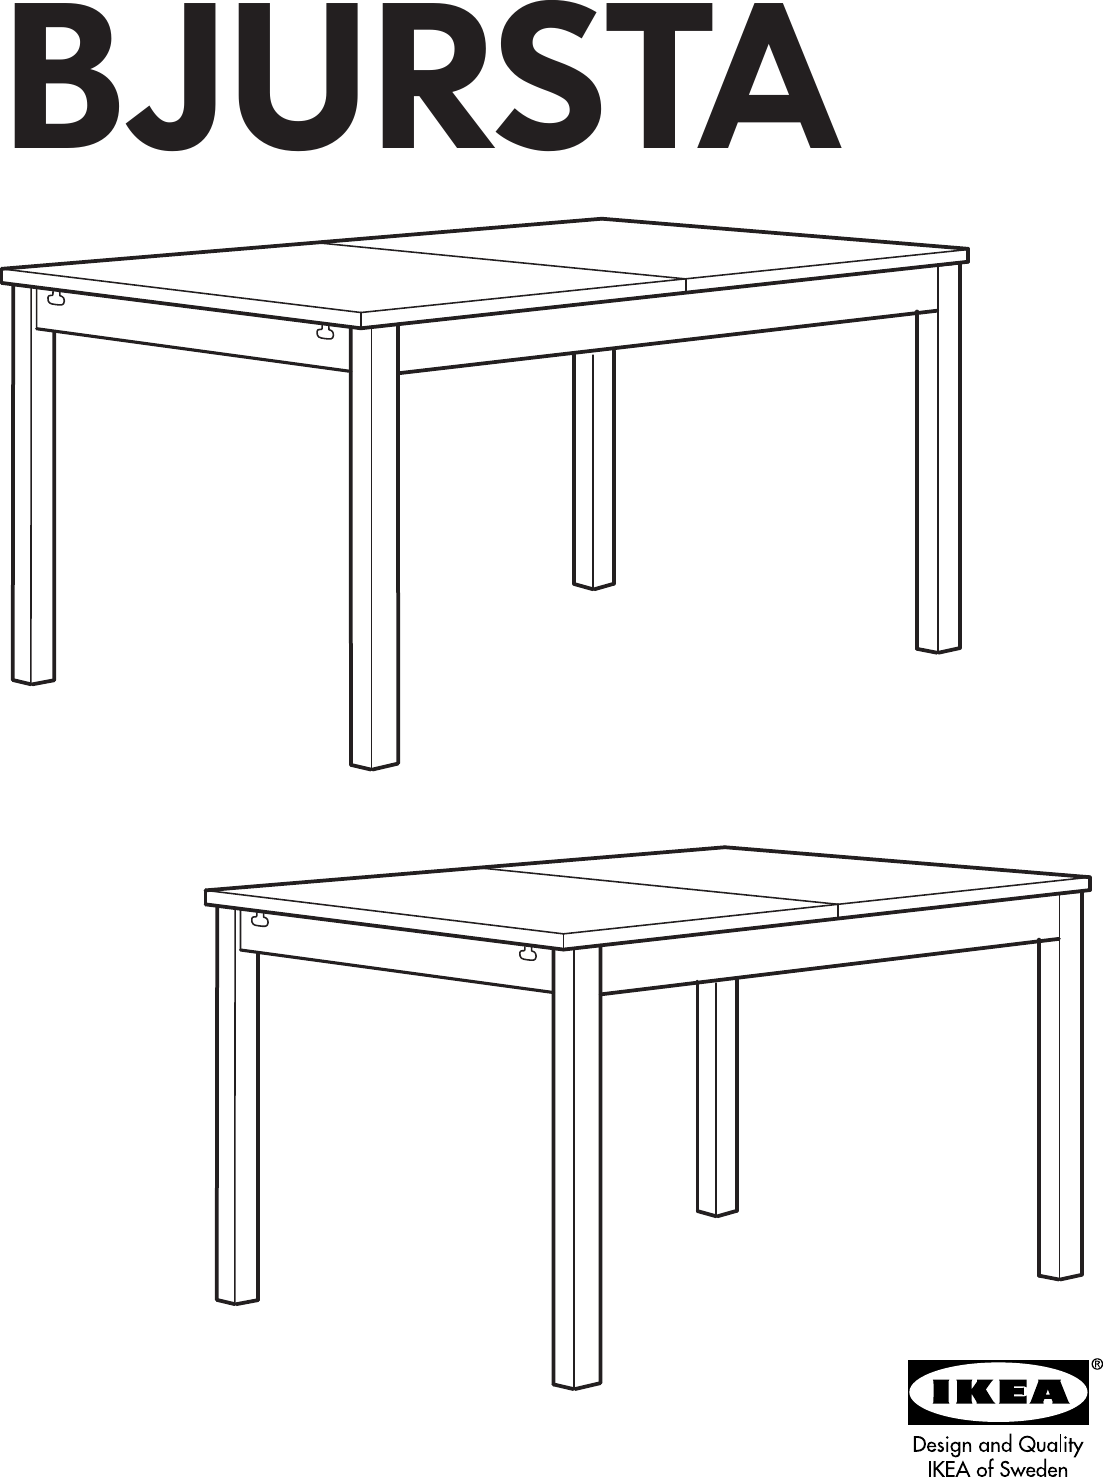 ikea bjursta dining table 55x33